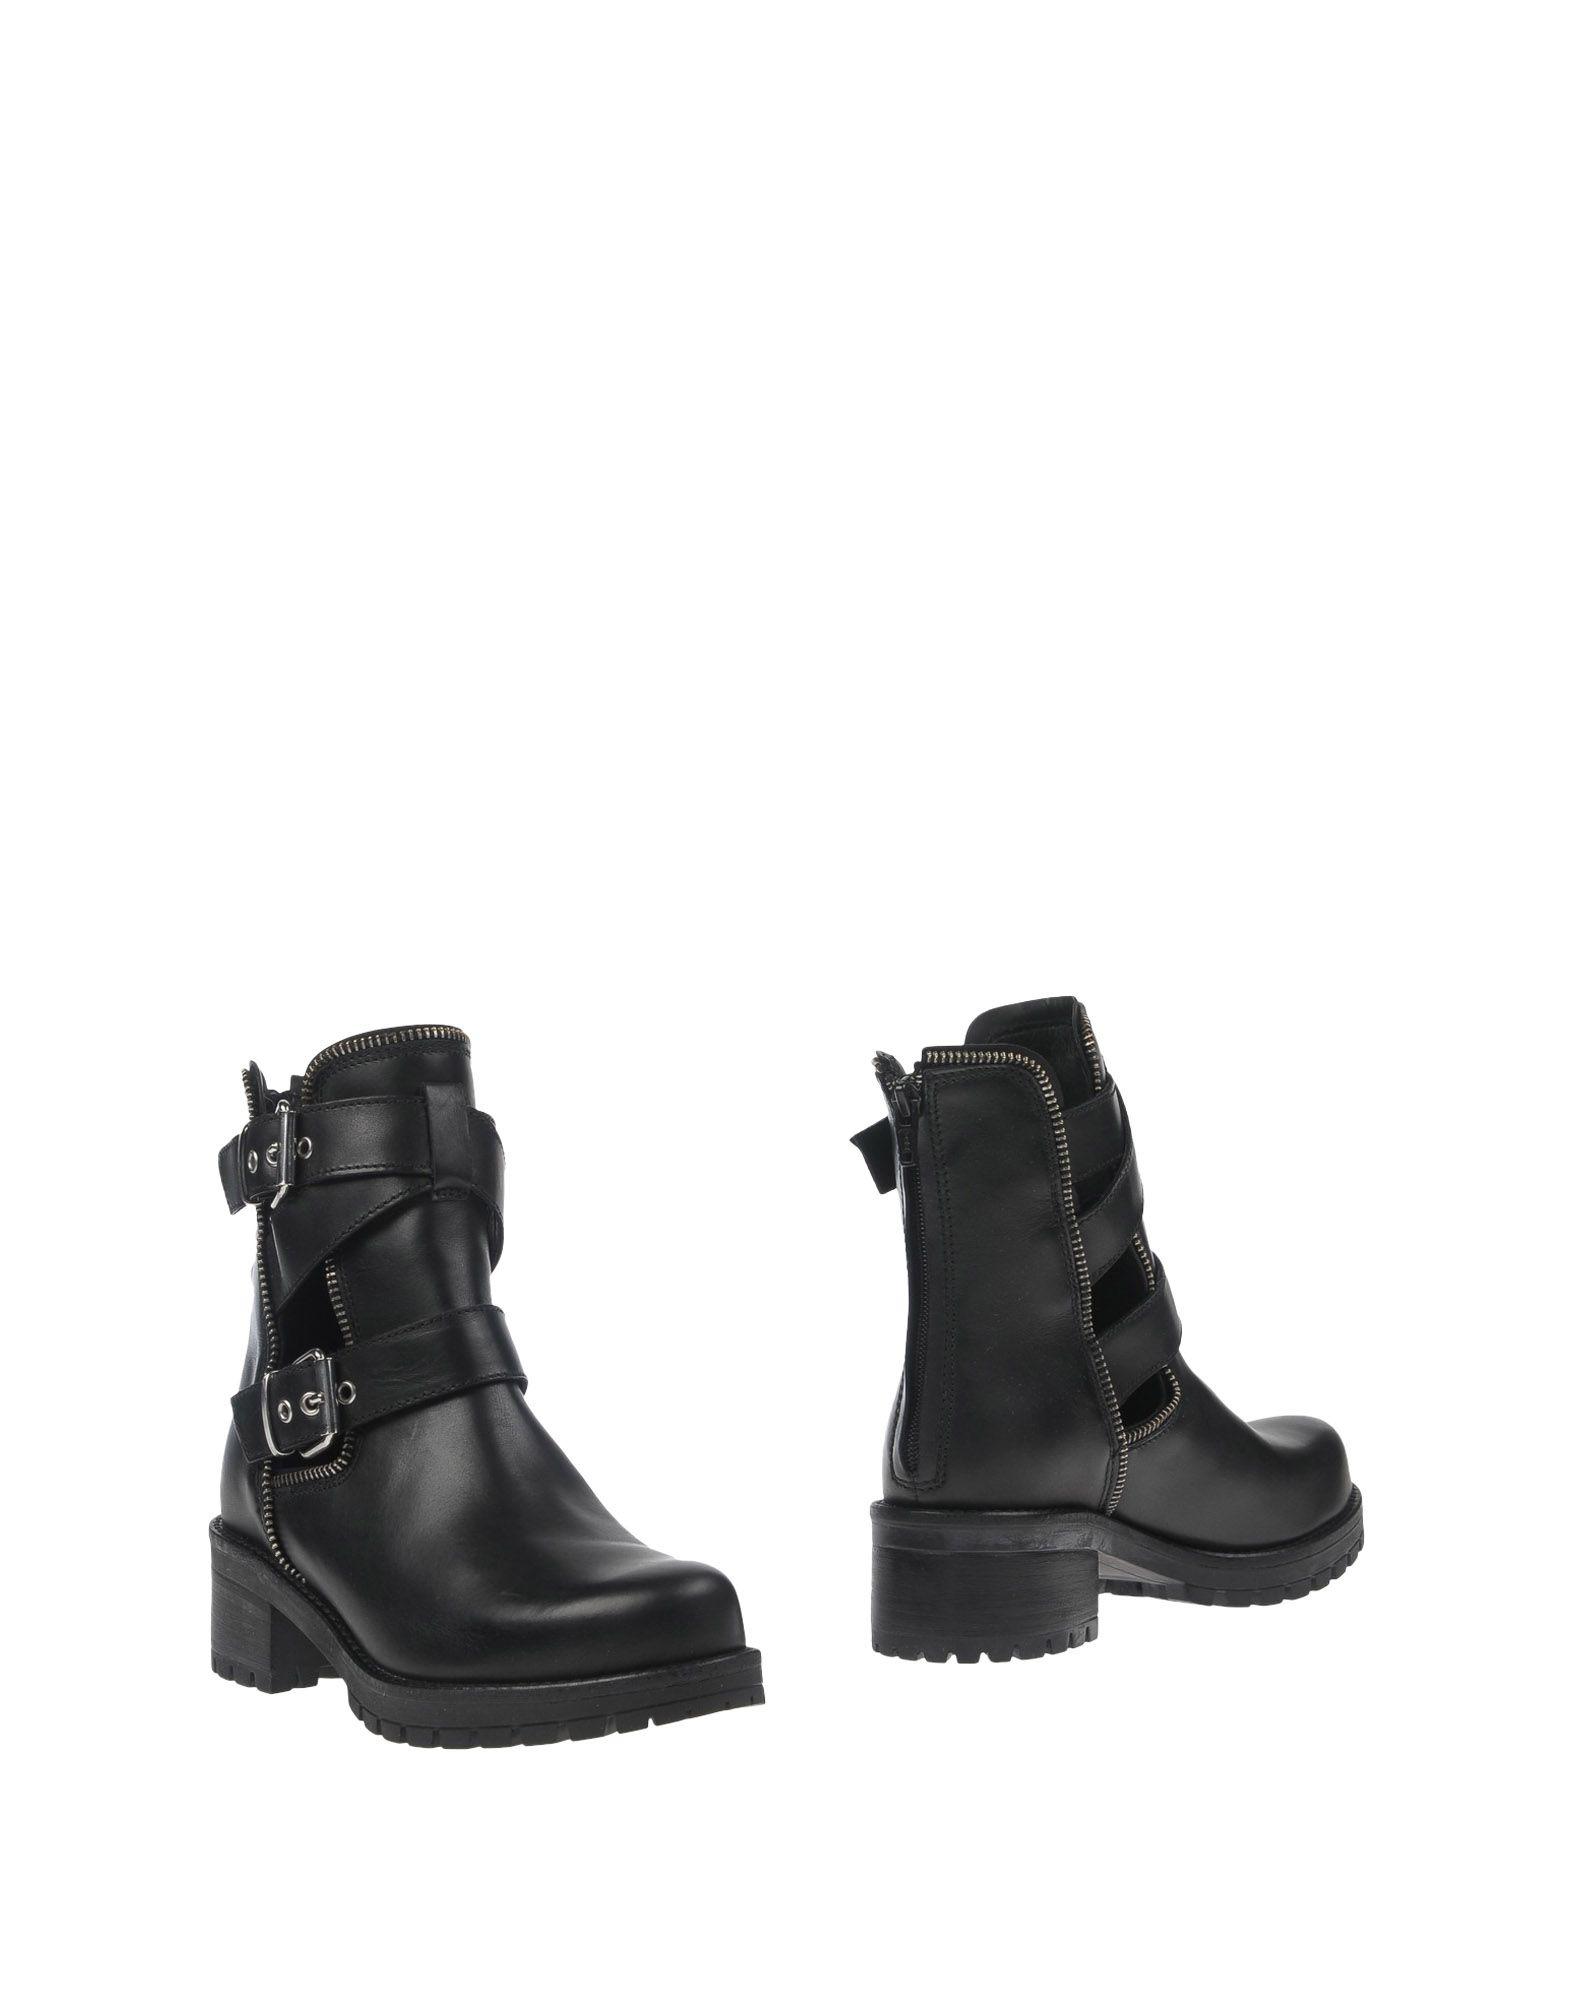 Cult Boot Femme Black/dark Grey SpbvQXFhC